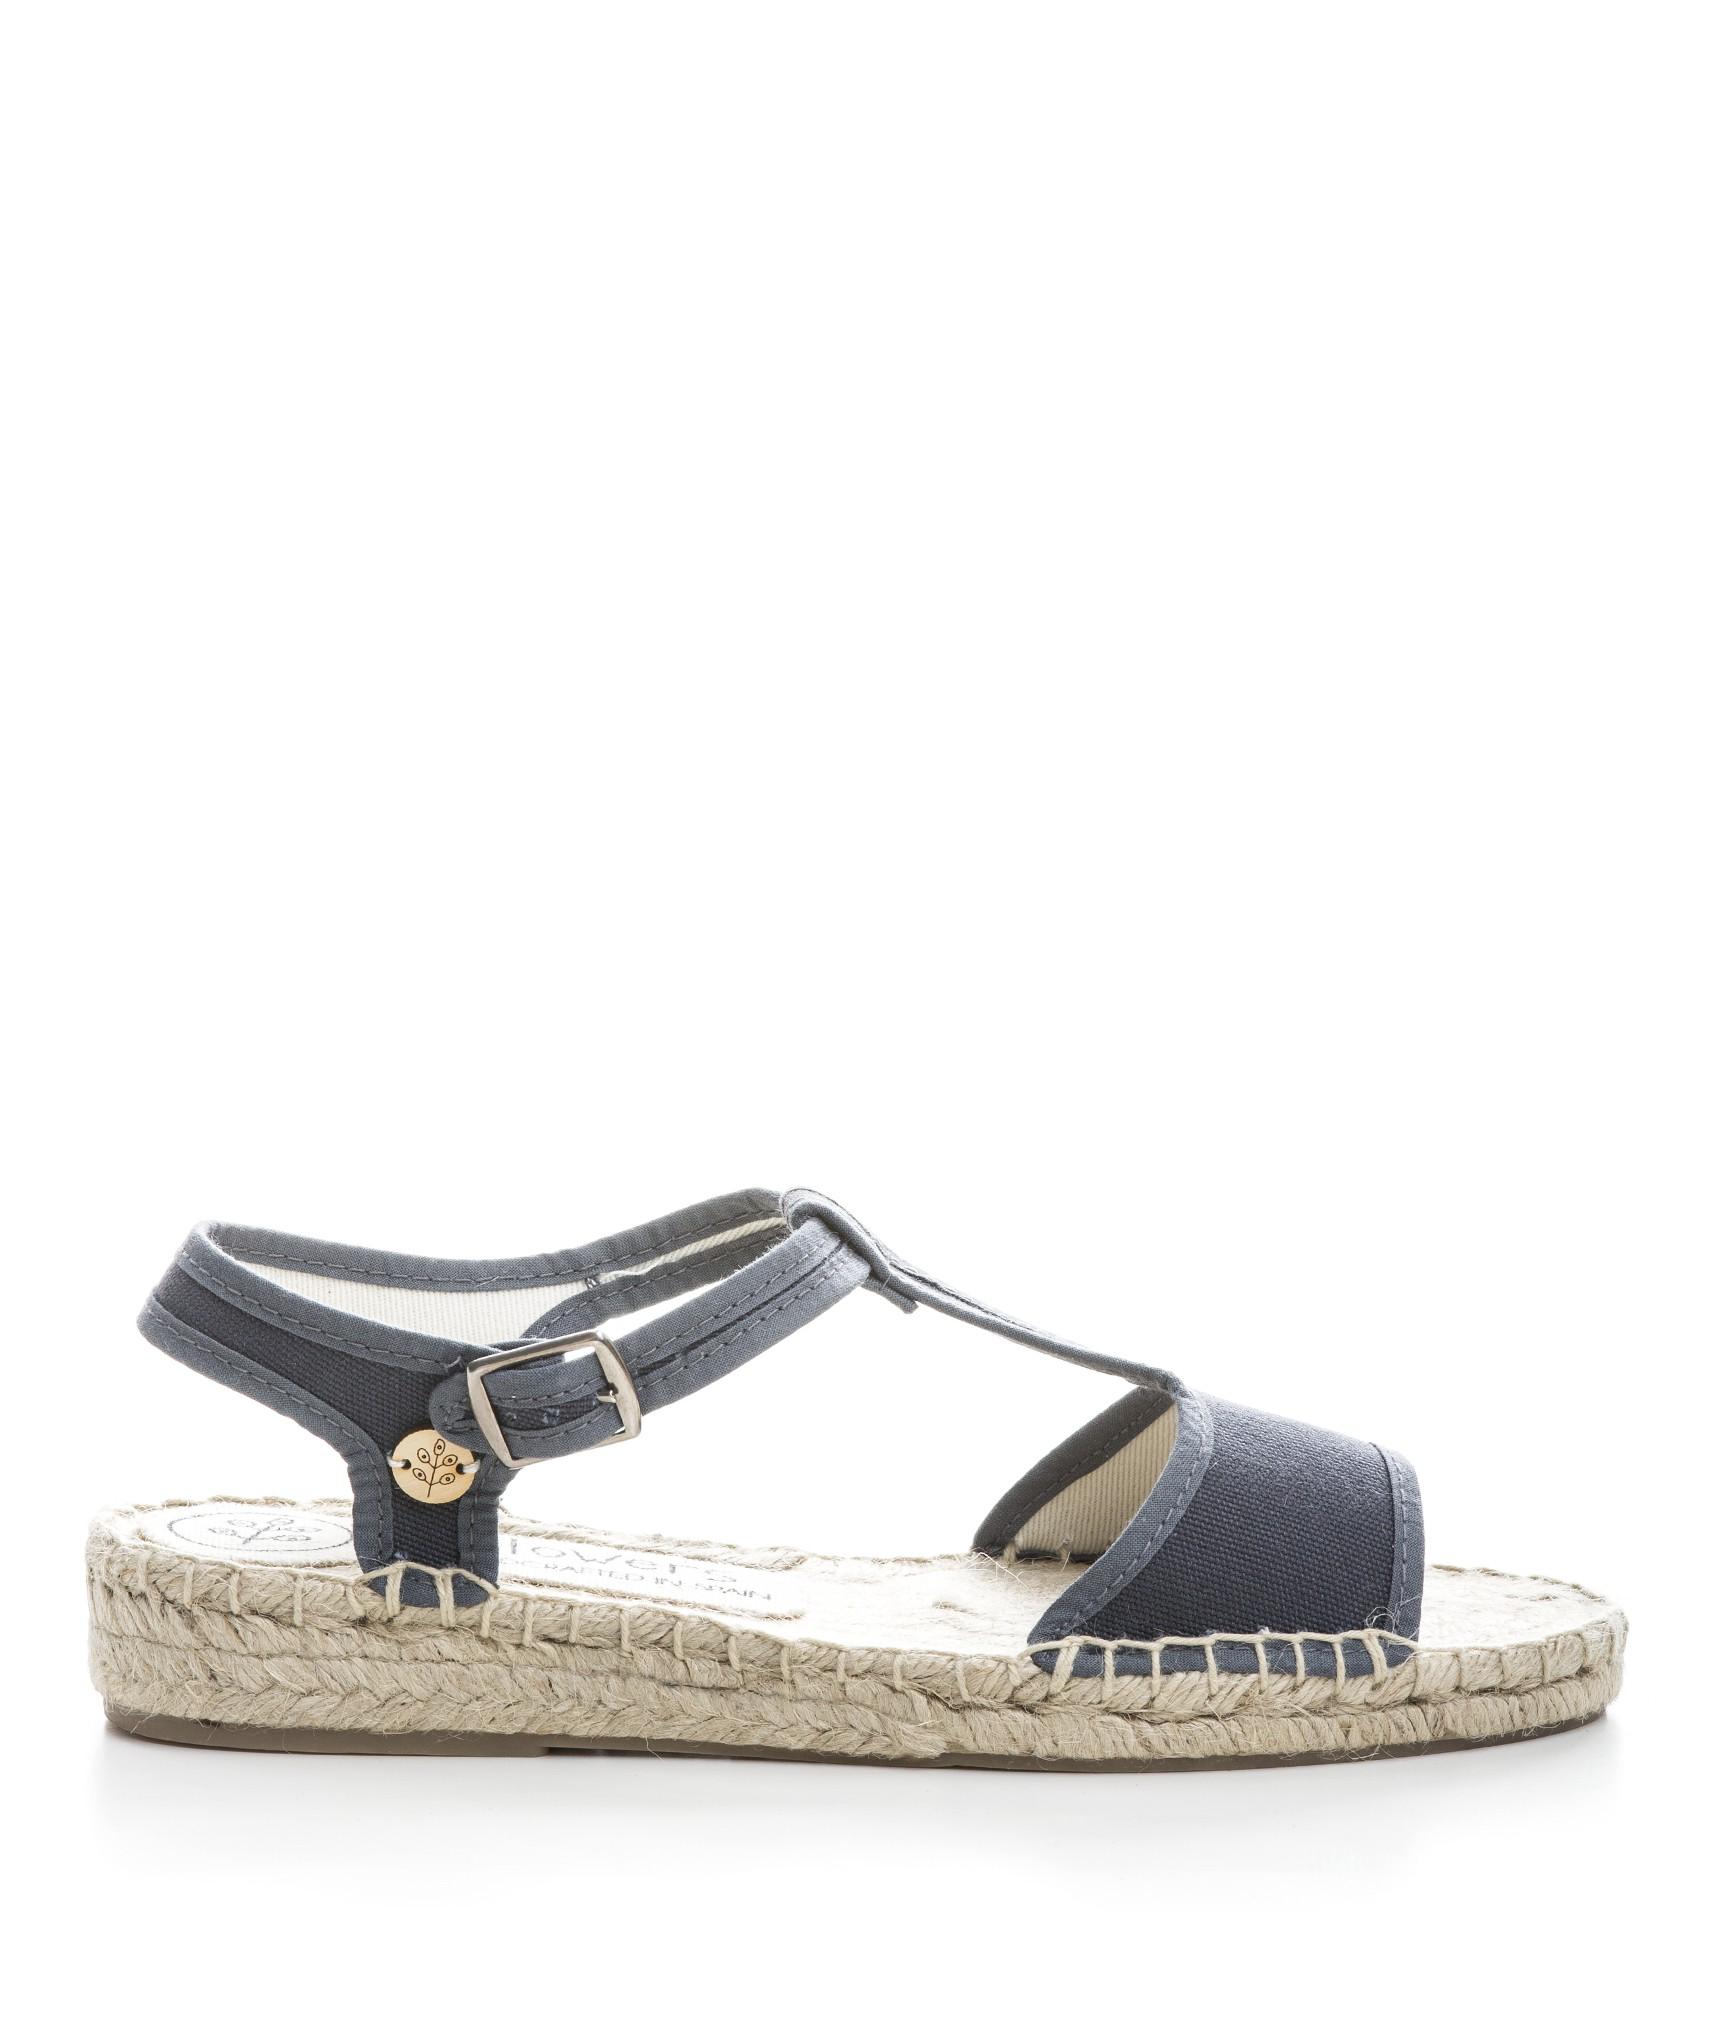 99d3842b6eff8e Slowers Luna Blau • Schuhe Faire Schuhe für Damen bei glore kaufen • glore